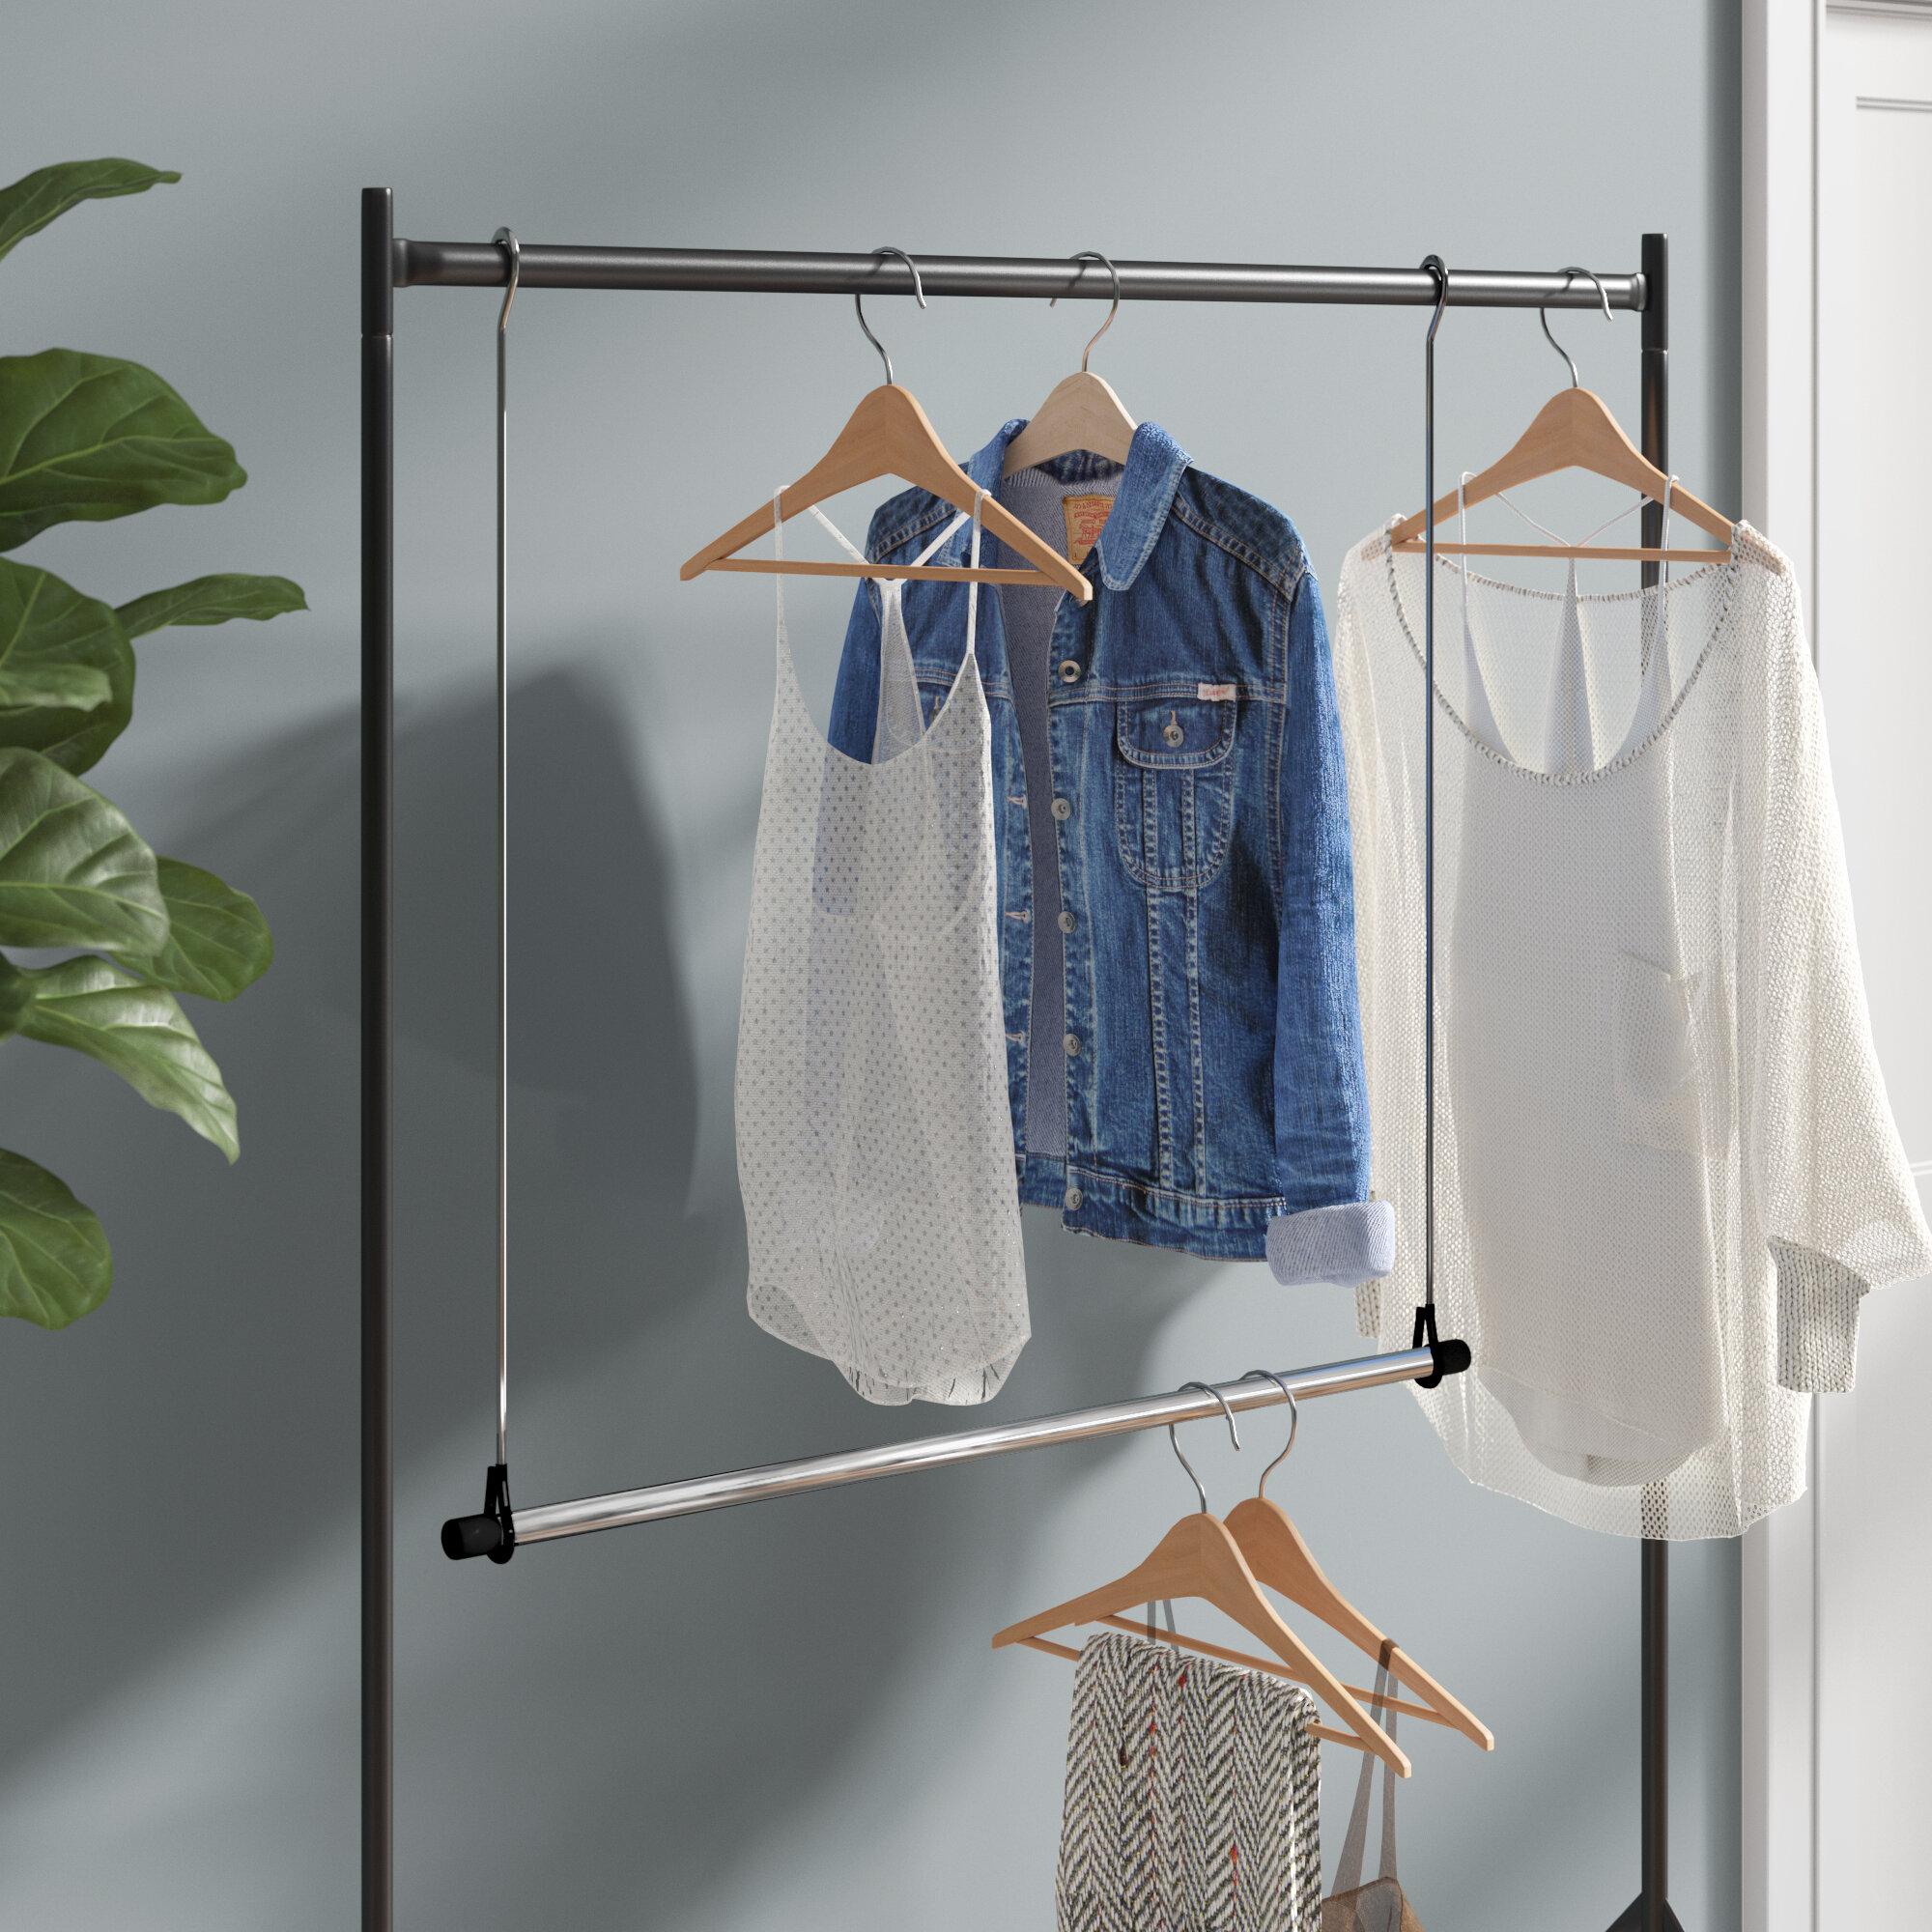 Cascio Hang Closet Rod Hanging Organizer